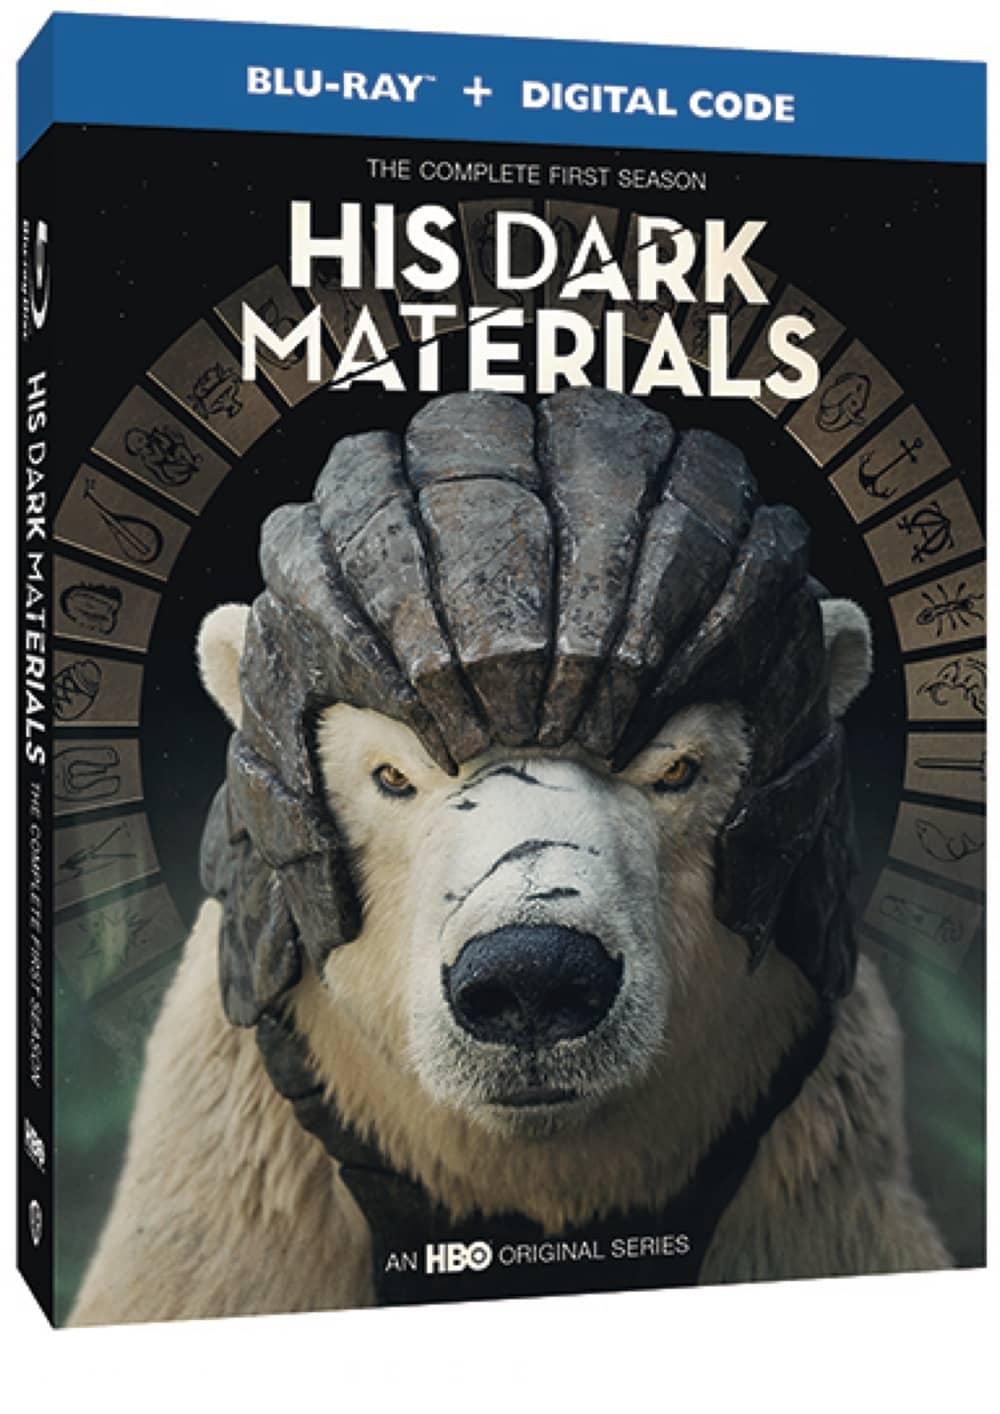 His Dark Materials S1 BD